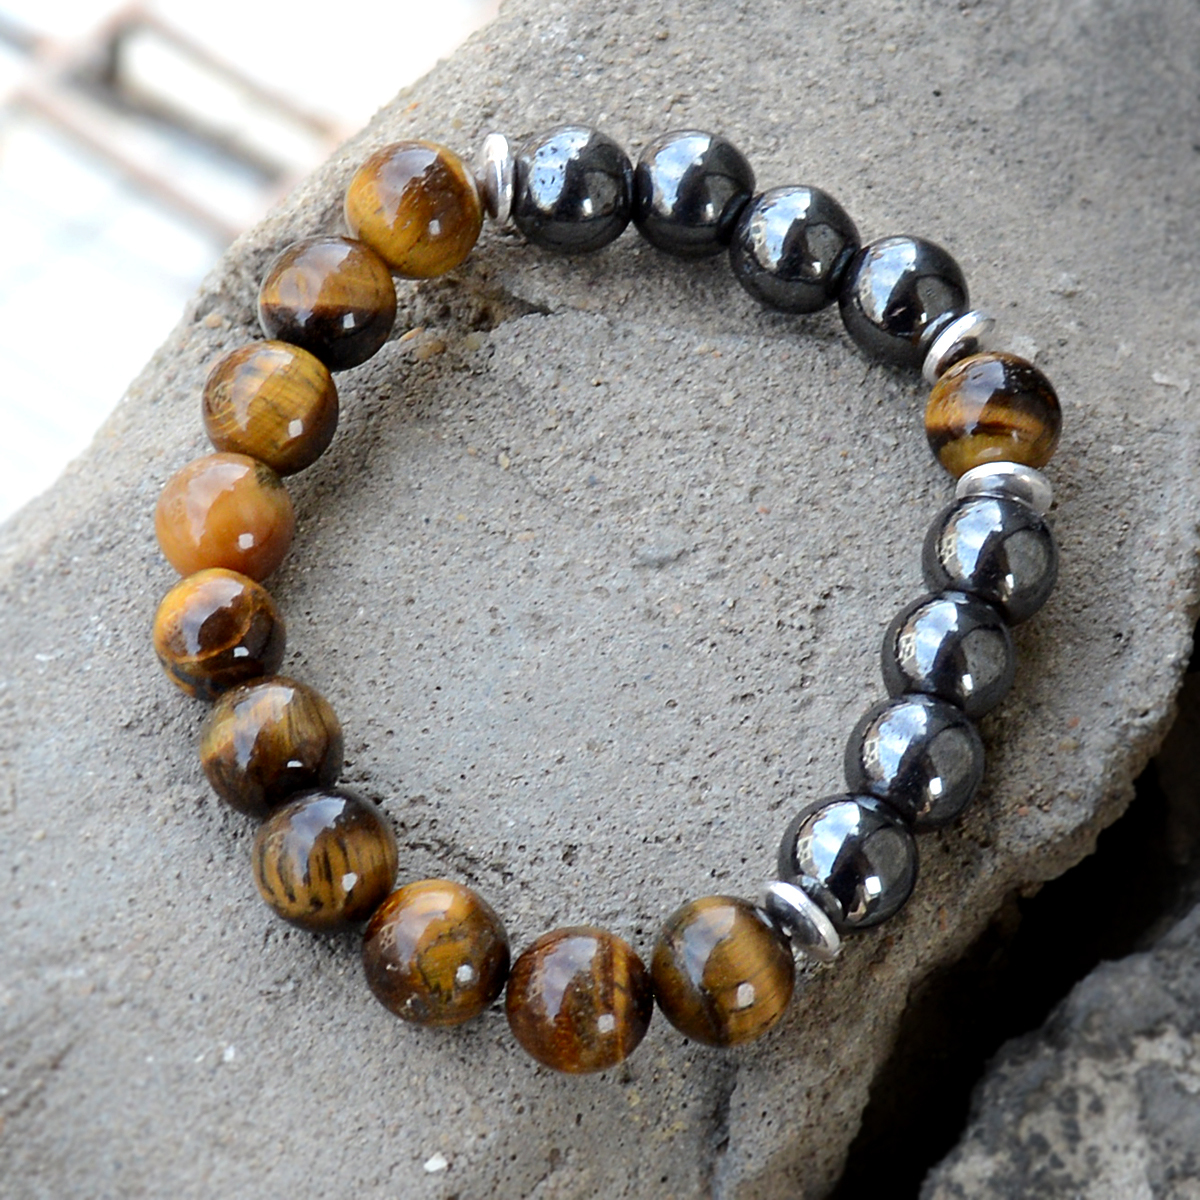 Hematite & Tiger Eye Silver Bracelet PG-156254